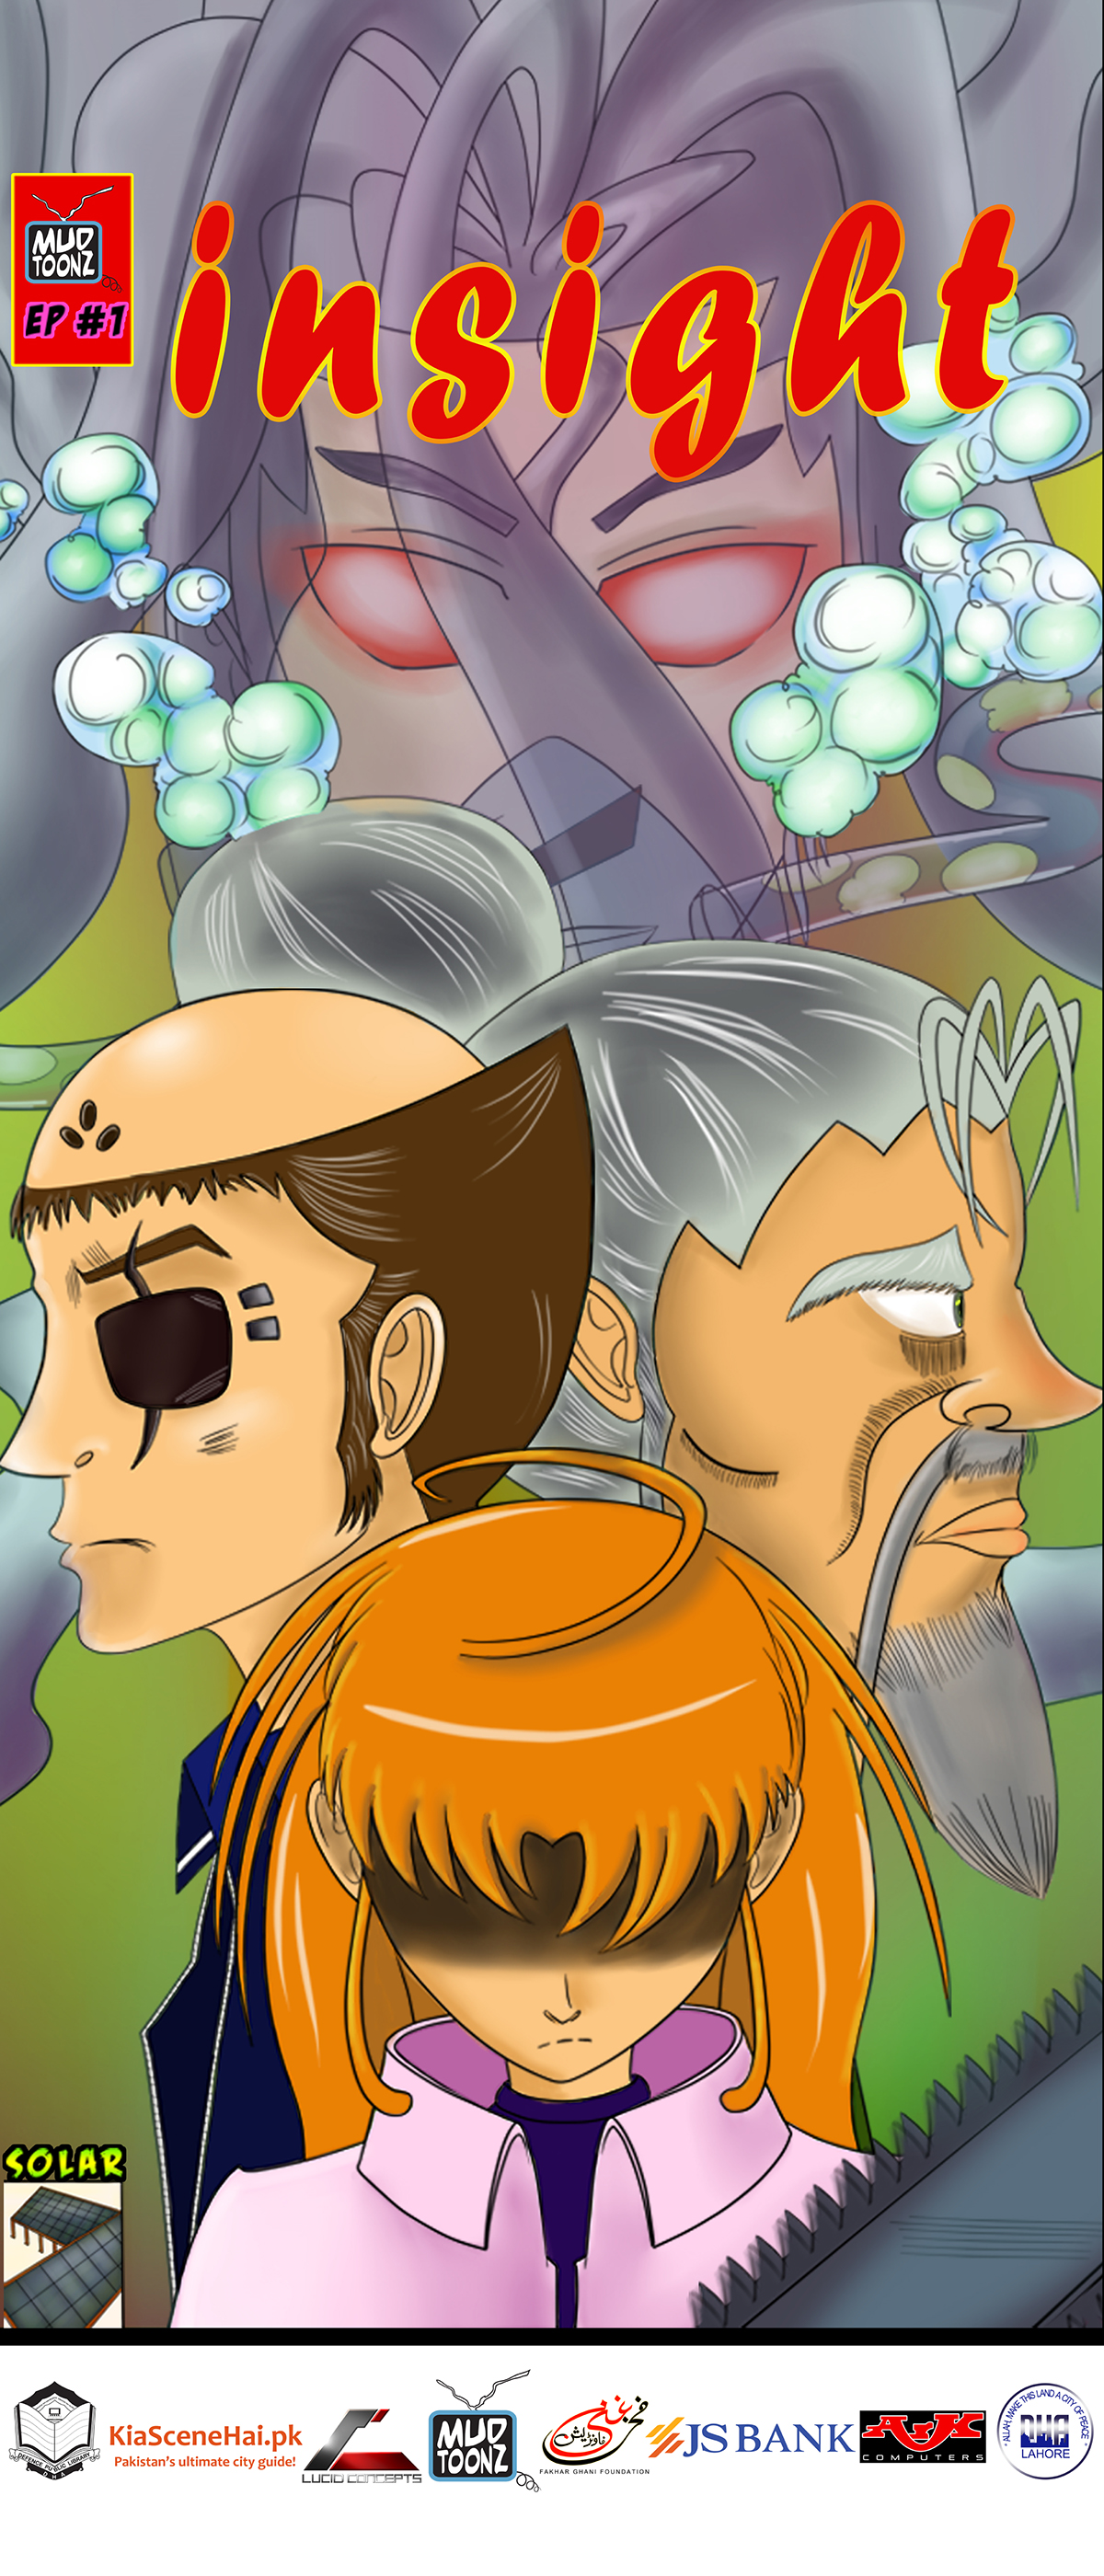 Comics manga anime pakistani art cartoon pakistan animation comic book page pakistan the acursed necklace pendant KODA MUDTOONZ Central Gitto Death Grave Walker Spider shakil uncle butt sgb shakil butt CCPK 2014 Comic Con Pk 2014 comicconpk